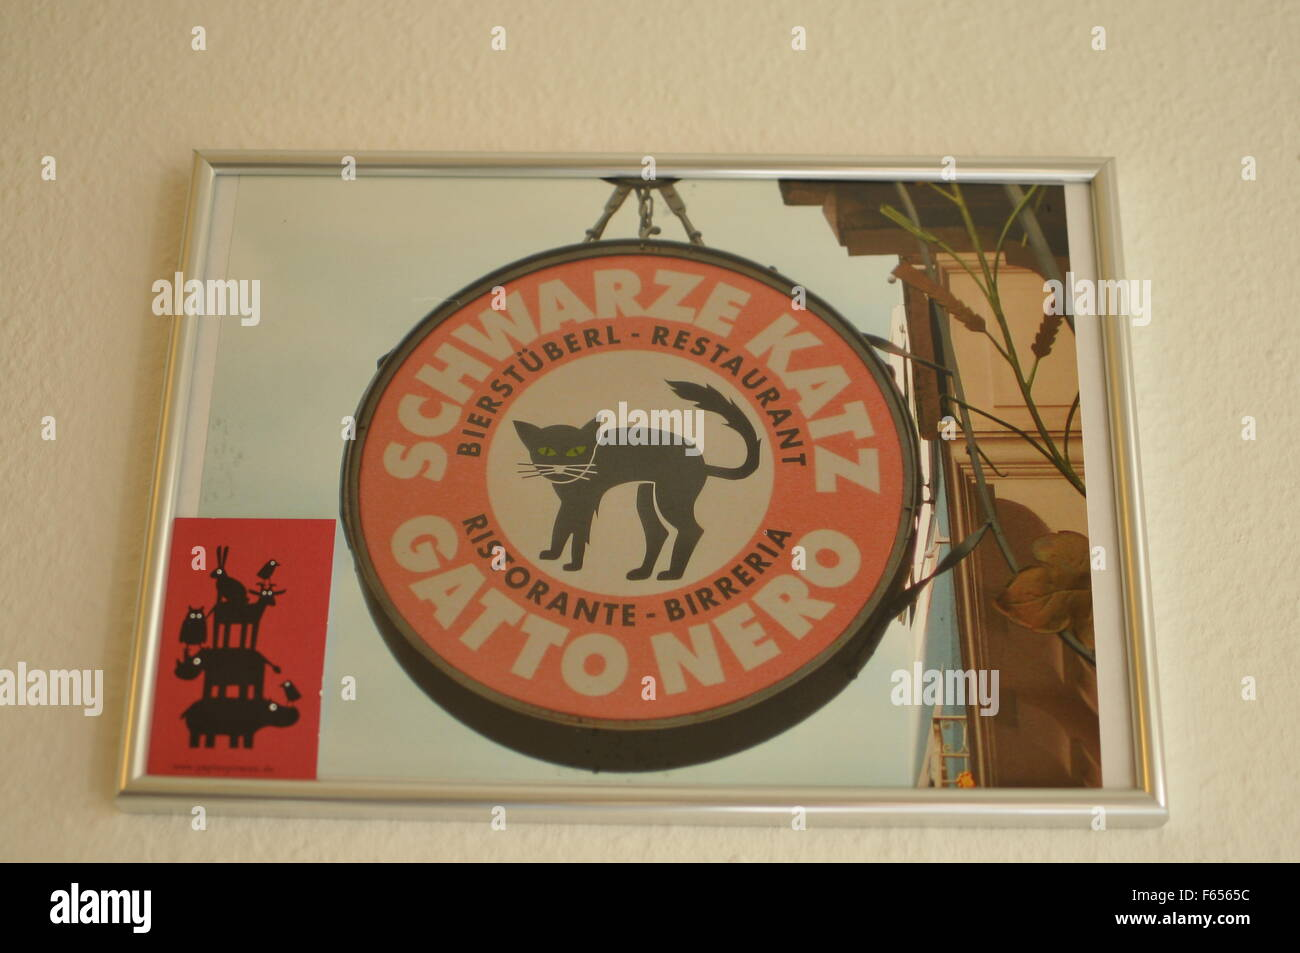 Gatto nero Restaurant Sign Stock Photo